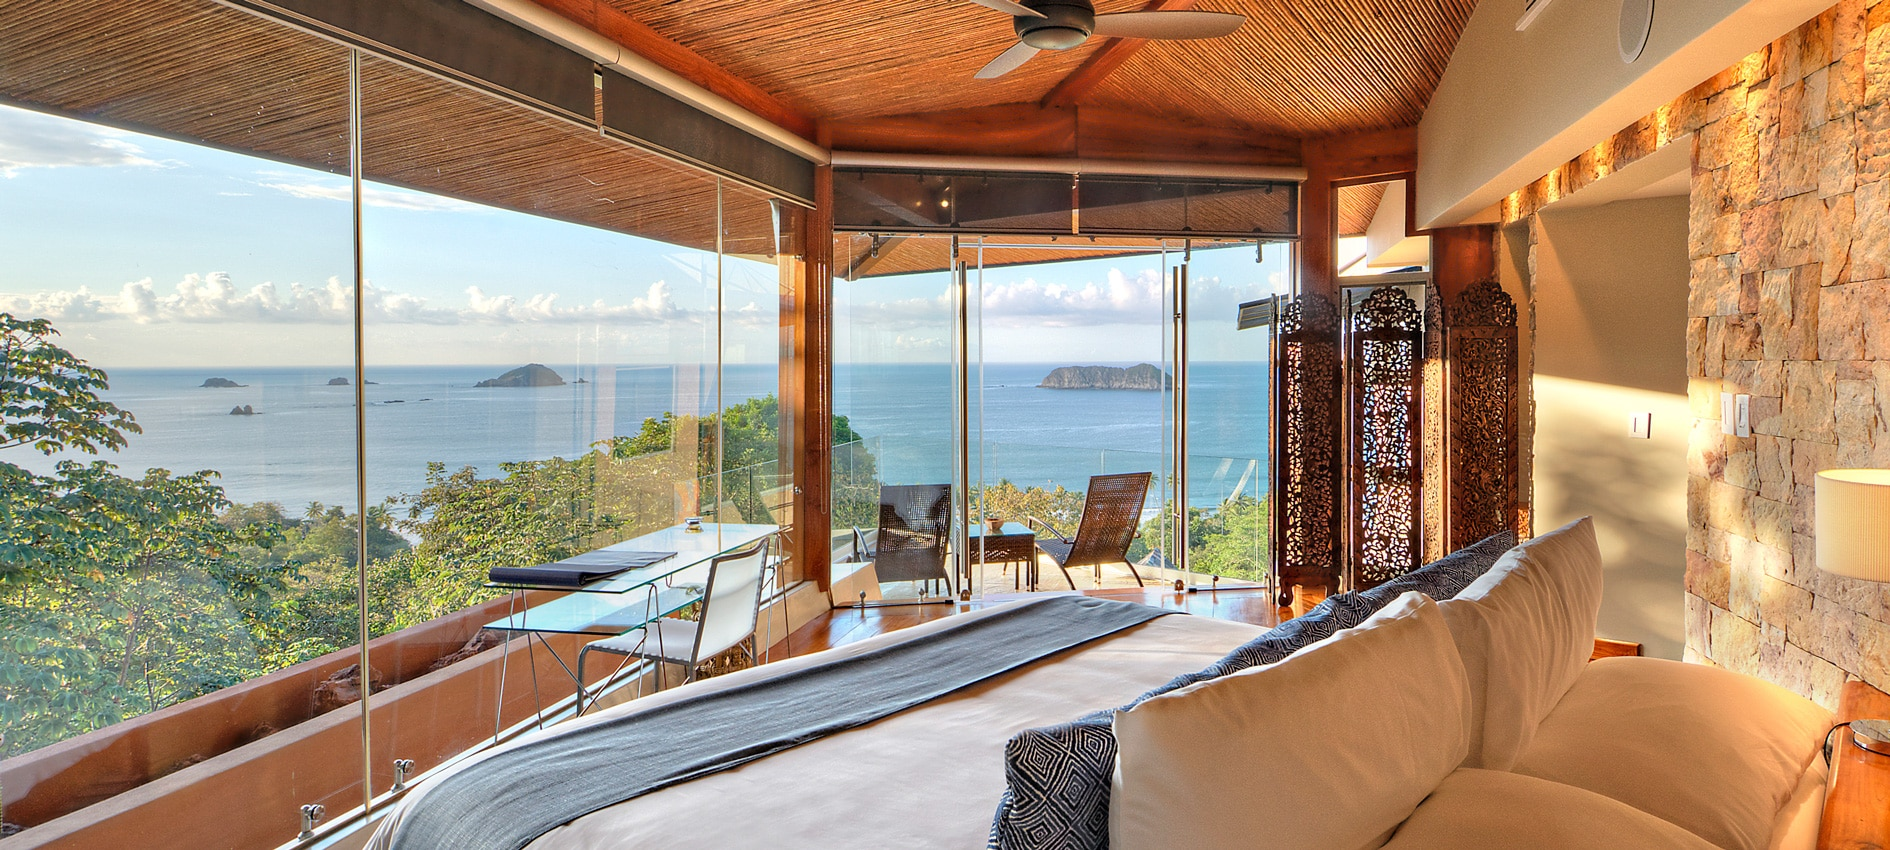 villa suites blue room